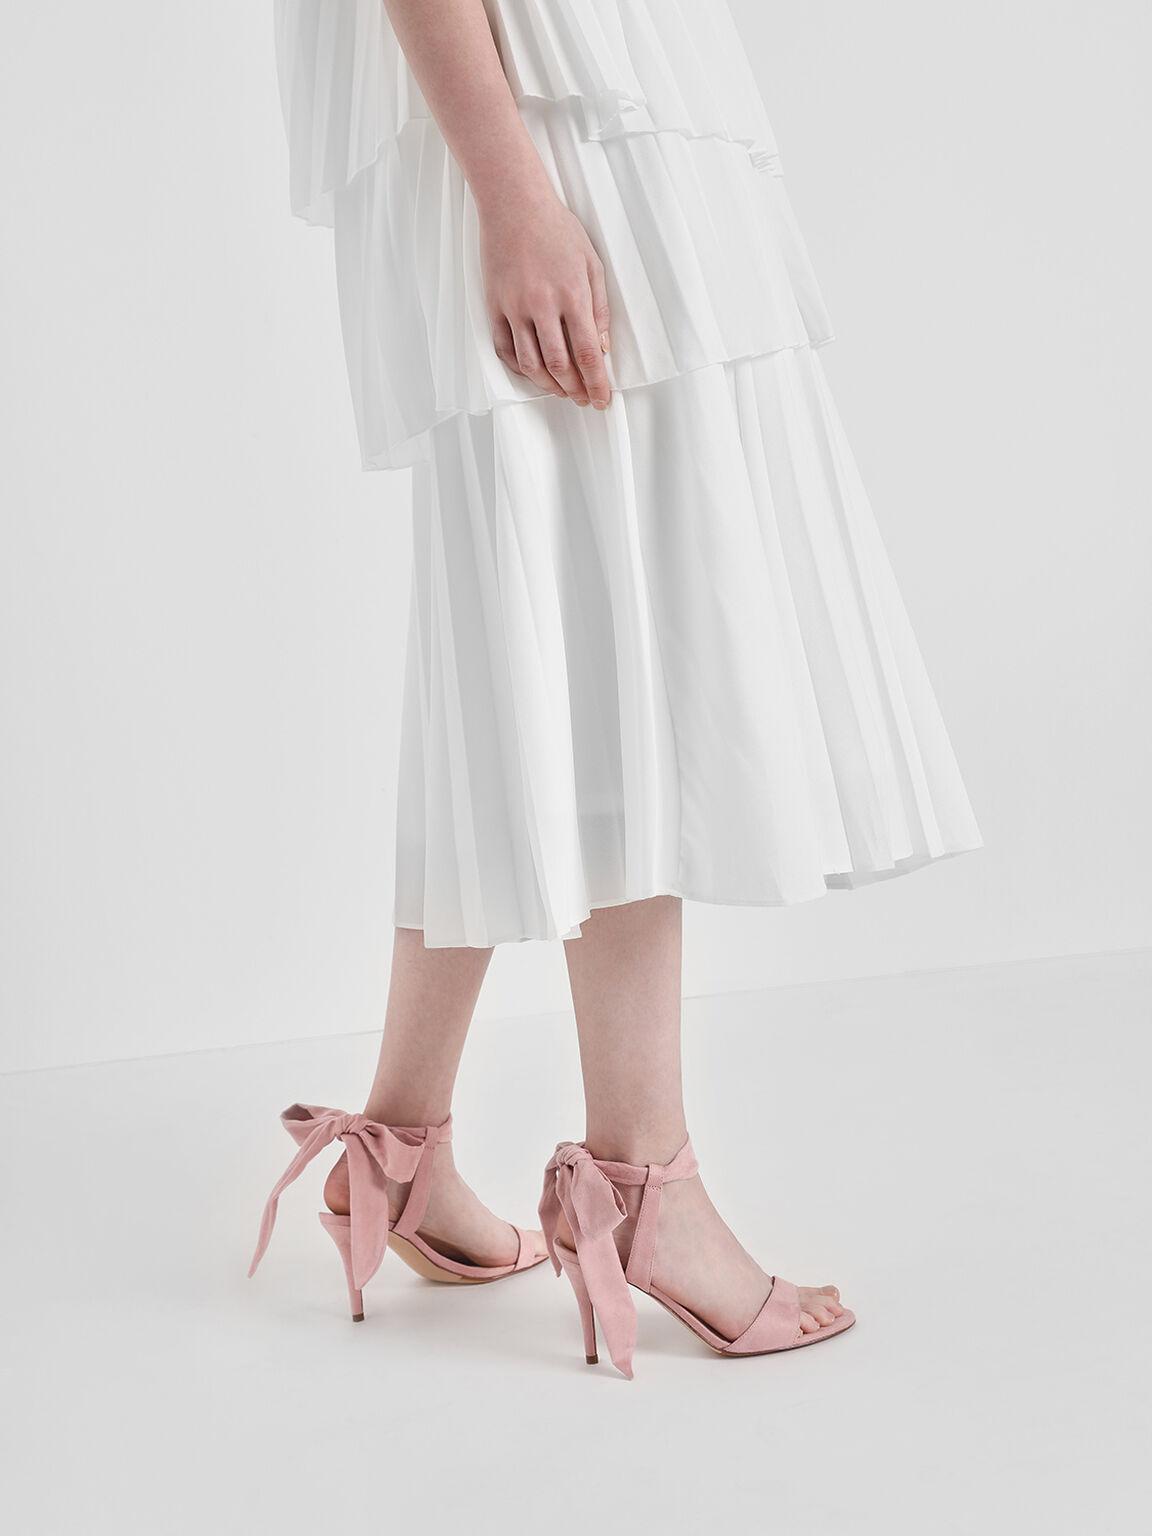 Tie Back Bow Heels, Blush, hi-res